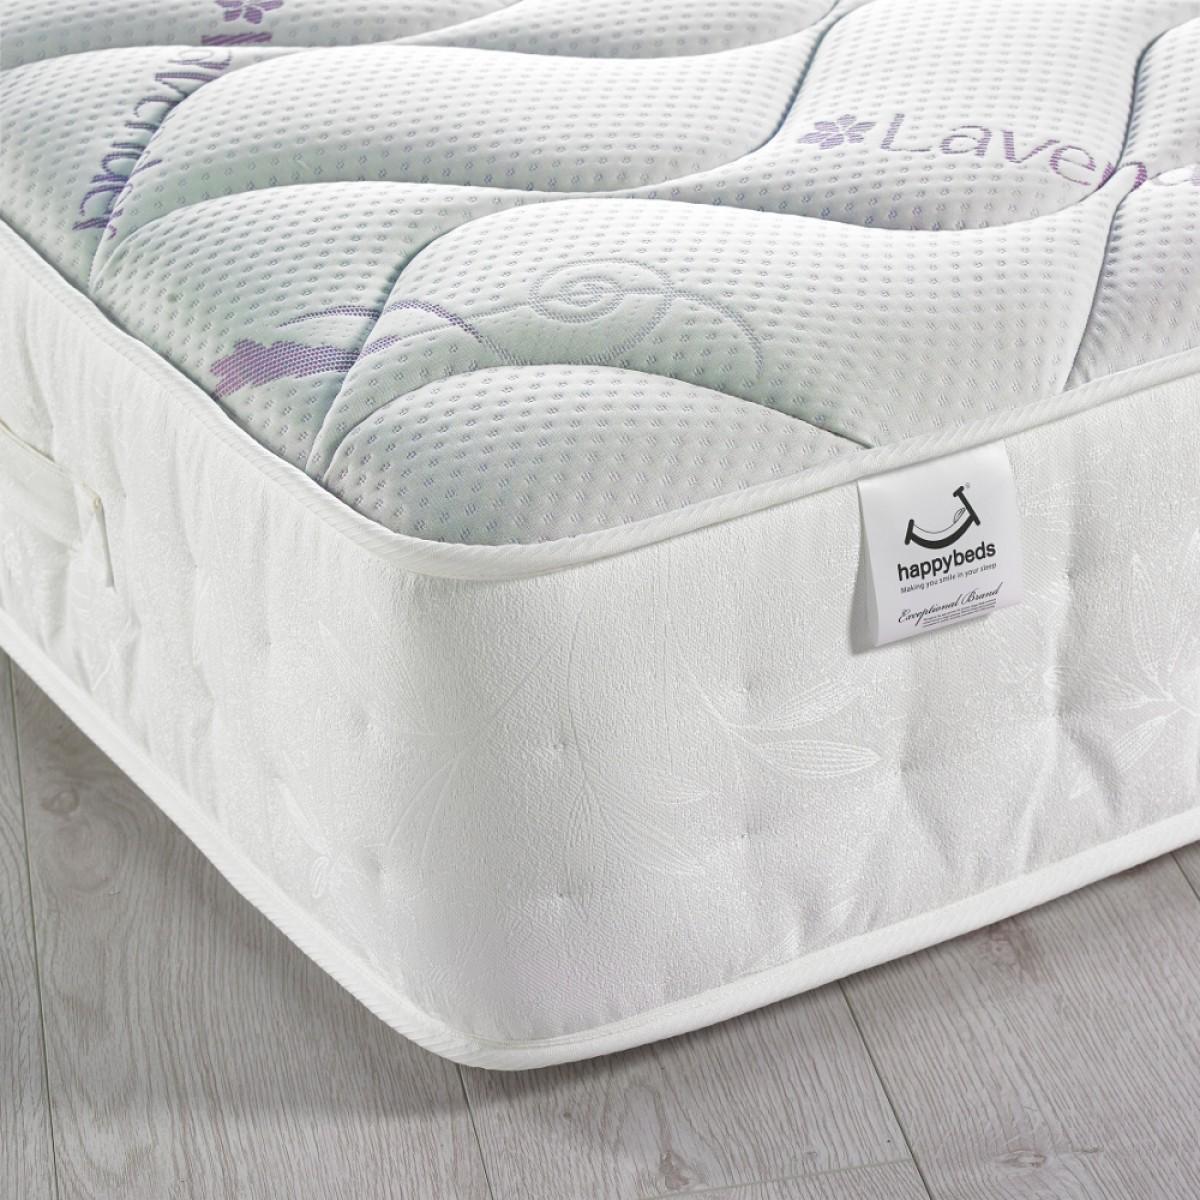 Lavender 3000 Pocket Sprung Memory Foam Mattress